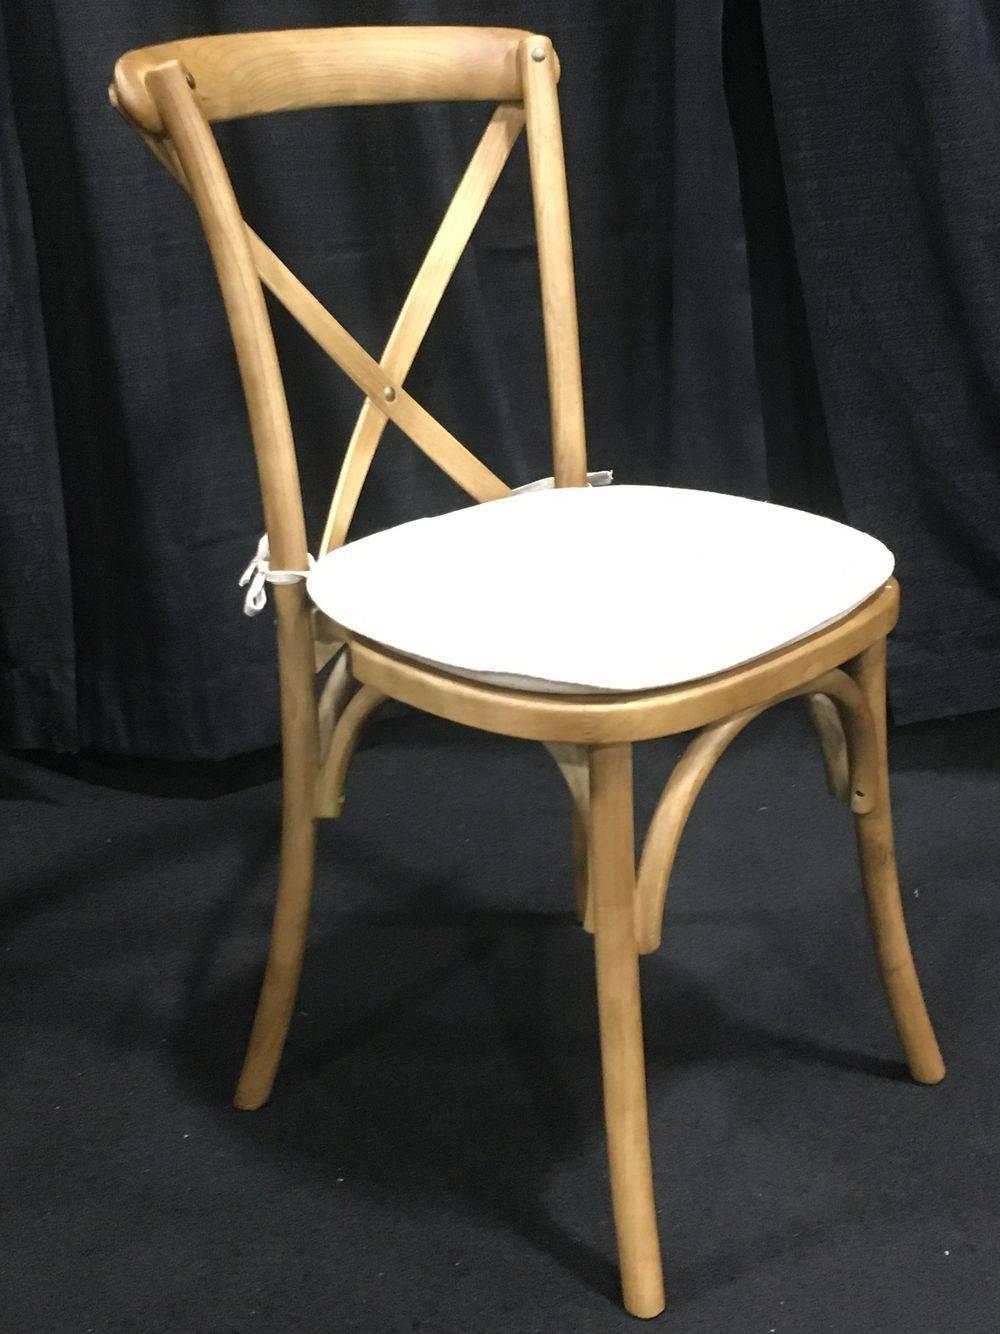 Cross Back Wood Chair Rental www.rentals801.com